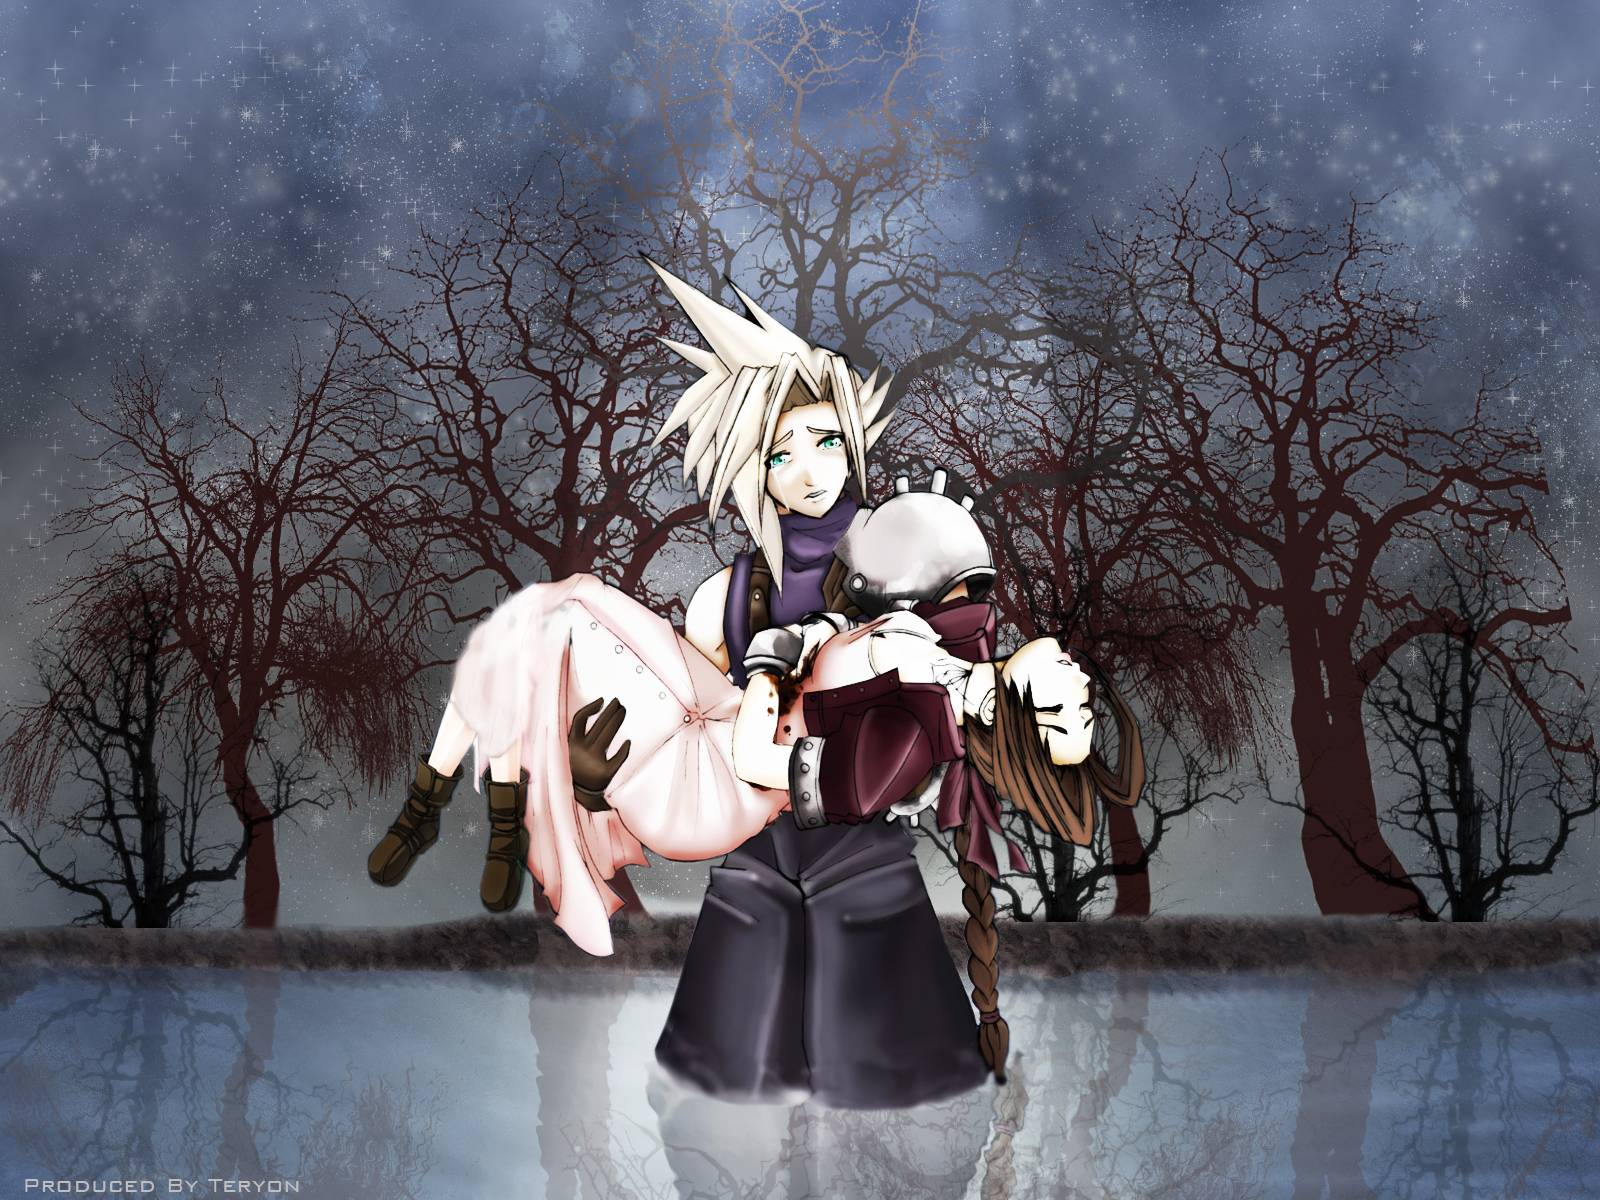 Final Fantasy VII Wallpaper HD Best Quality 1098 Wallpaper gamejetz 1600x1200